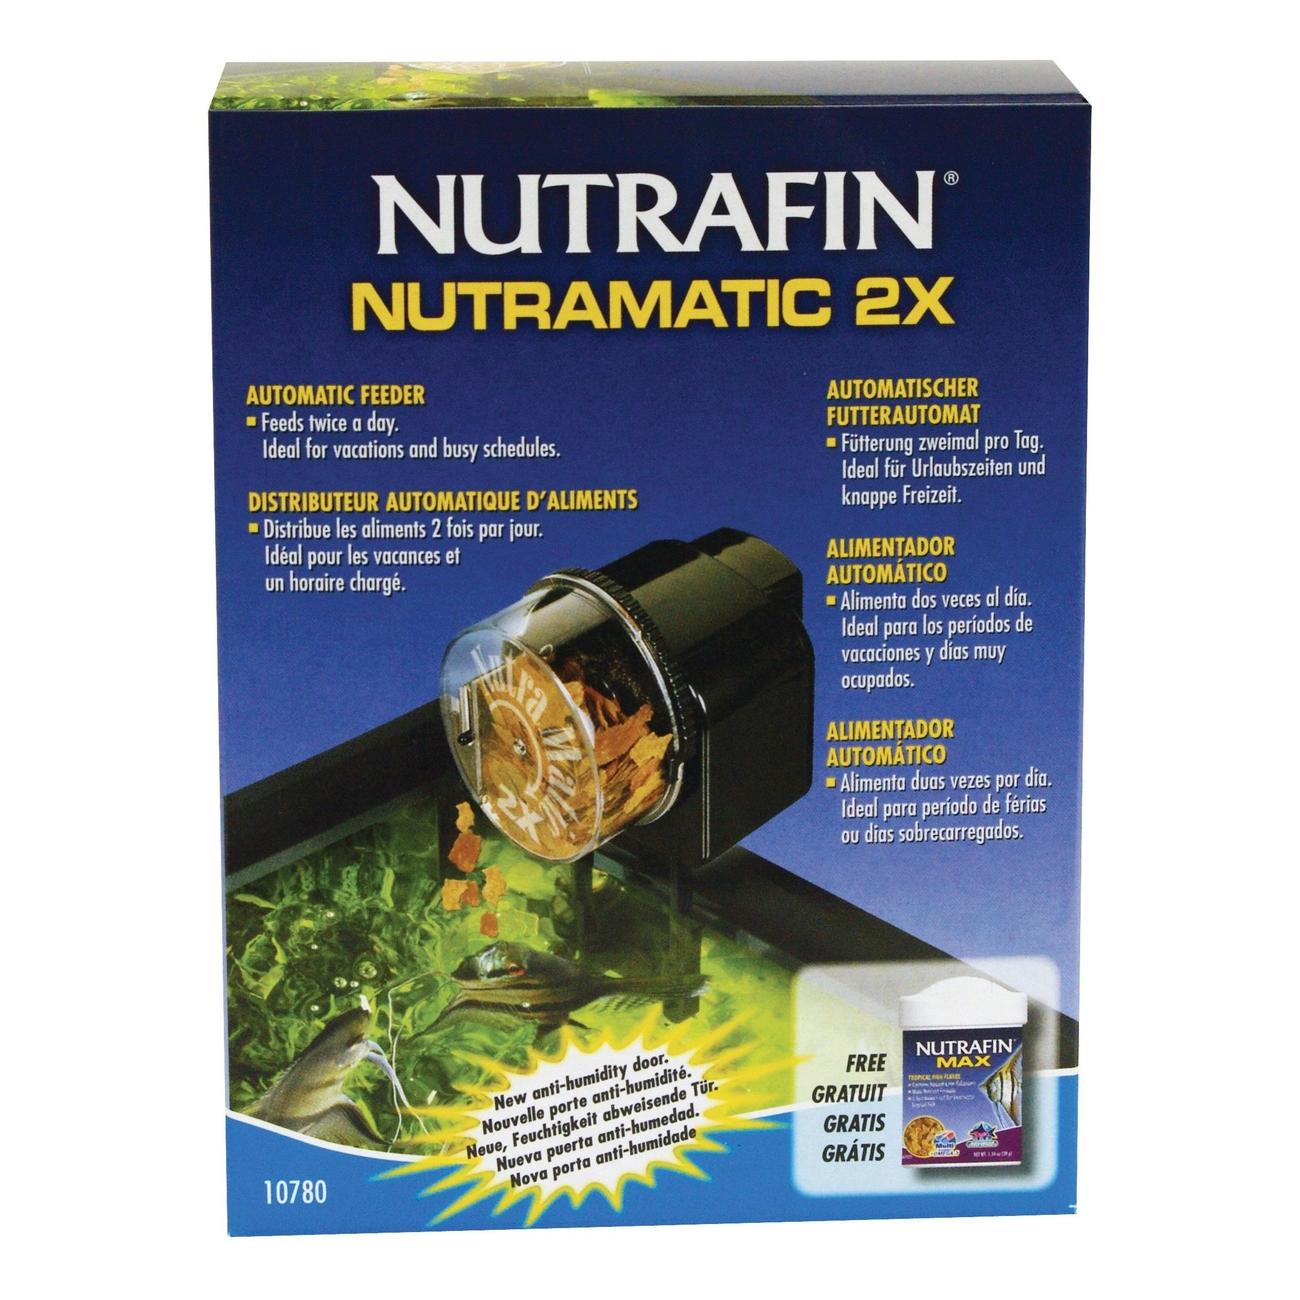 Nutrafin Nutramatic Futterautomat 2